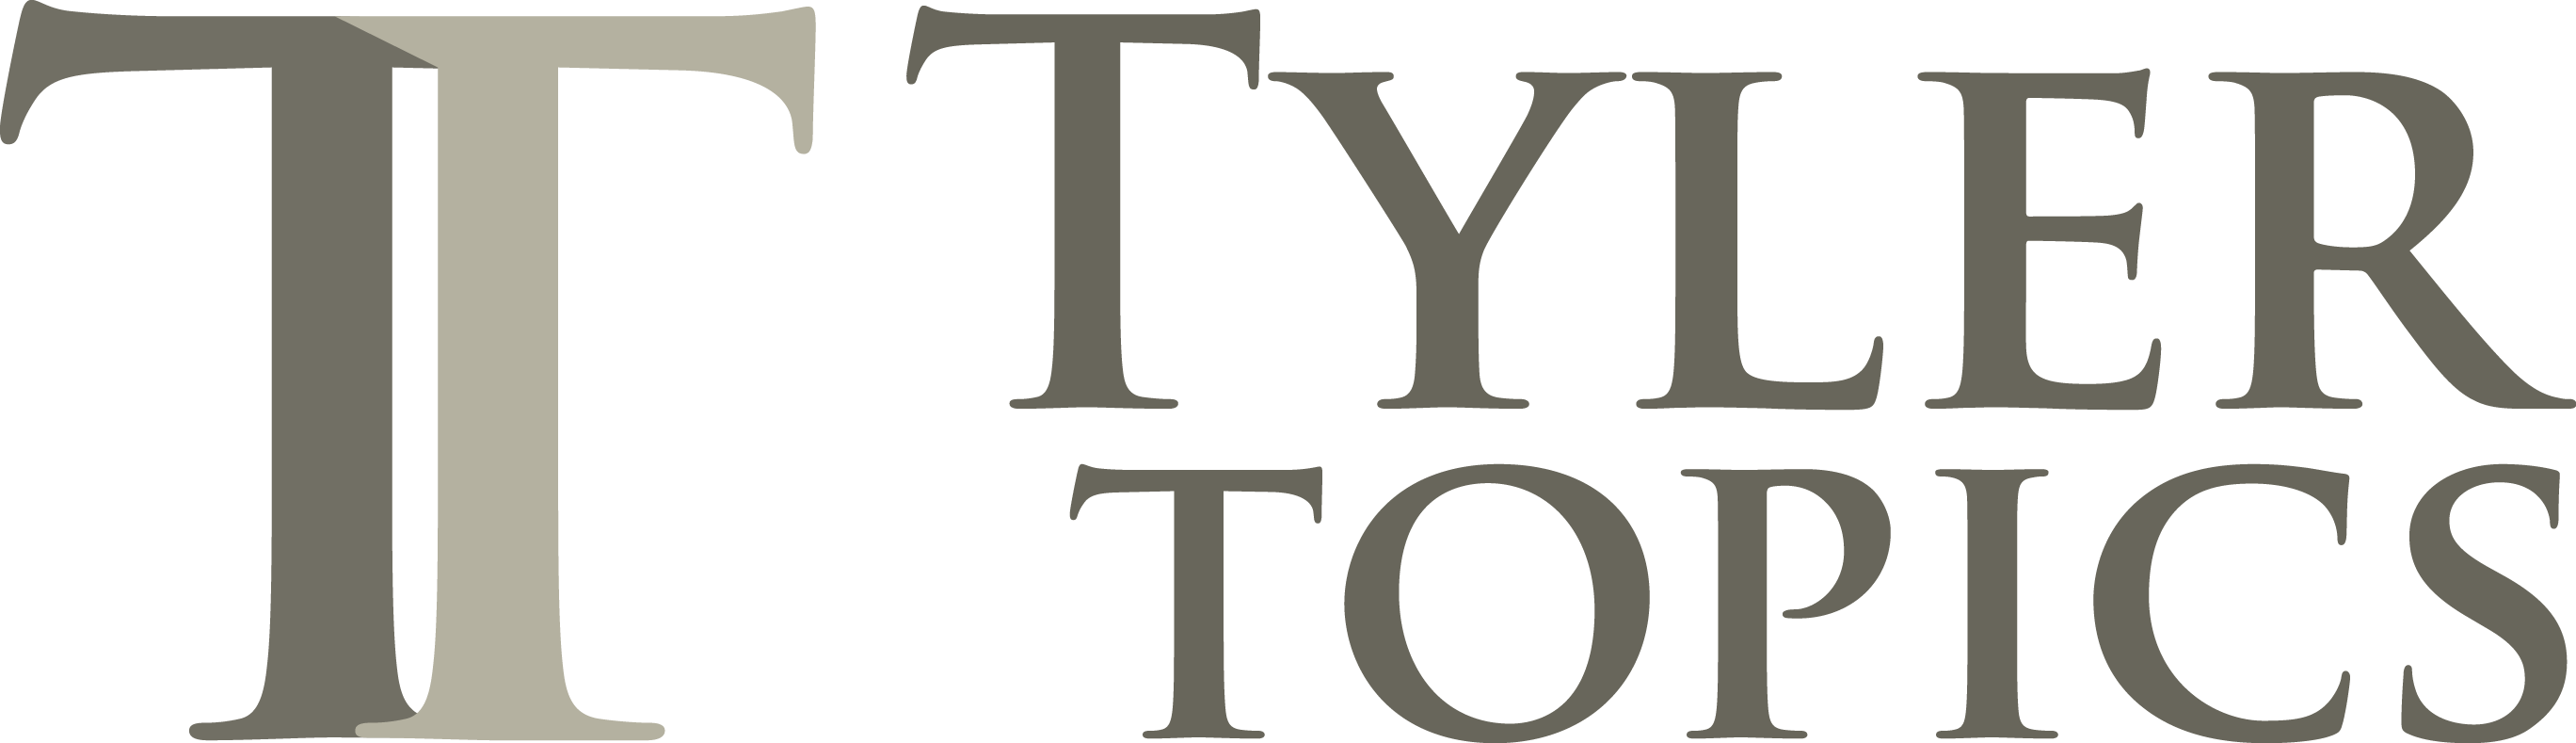 Tyler Topics